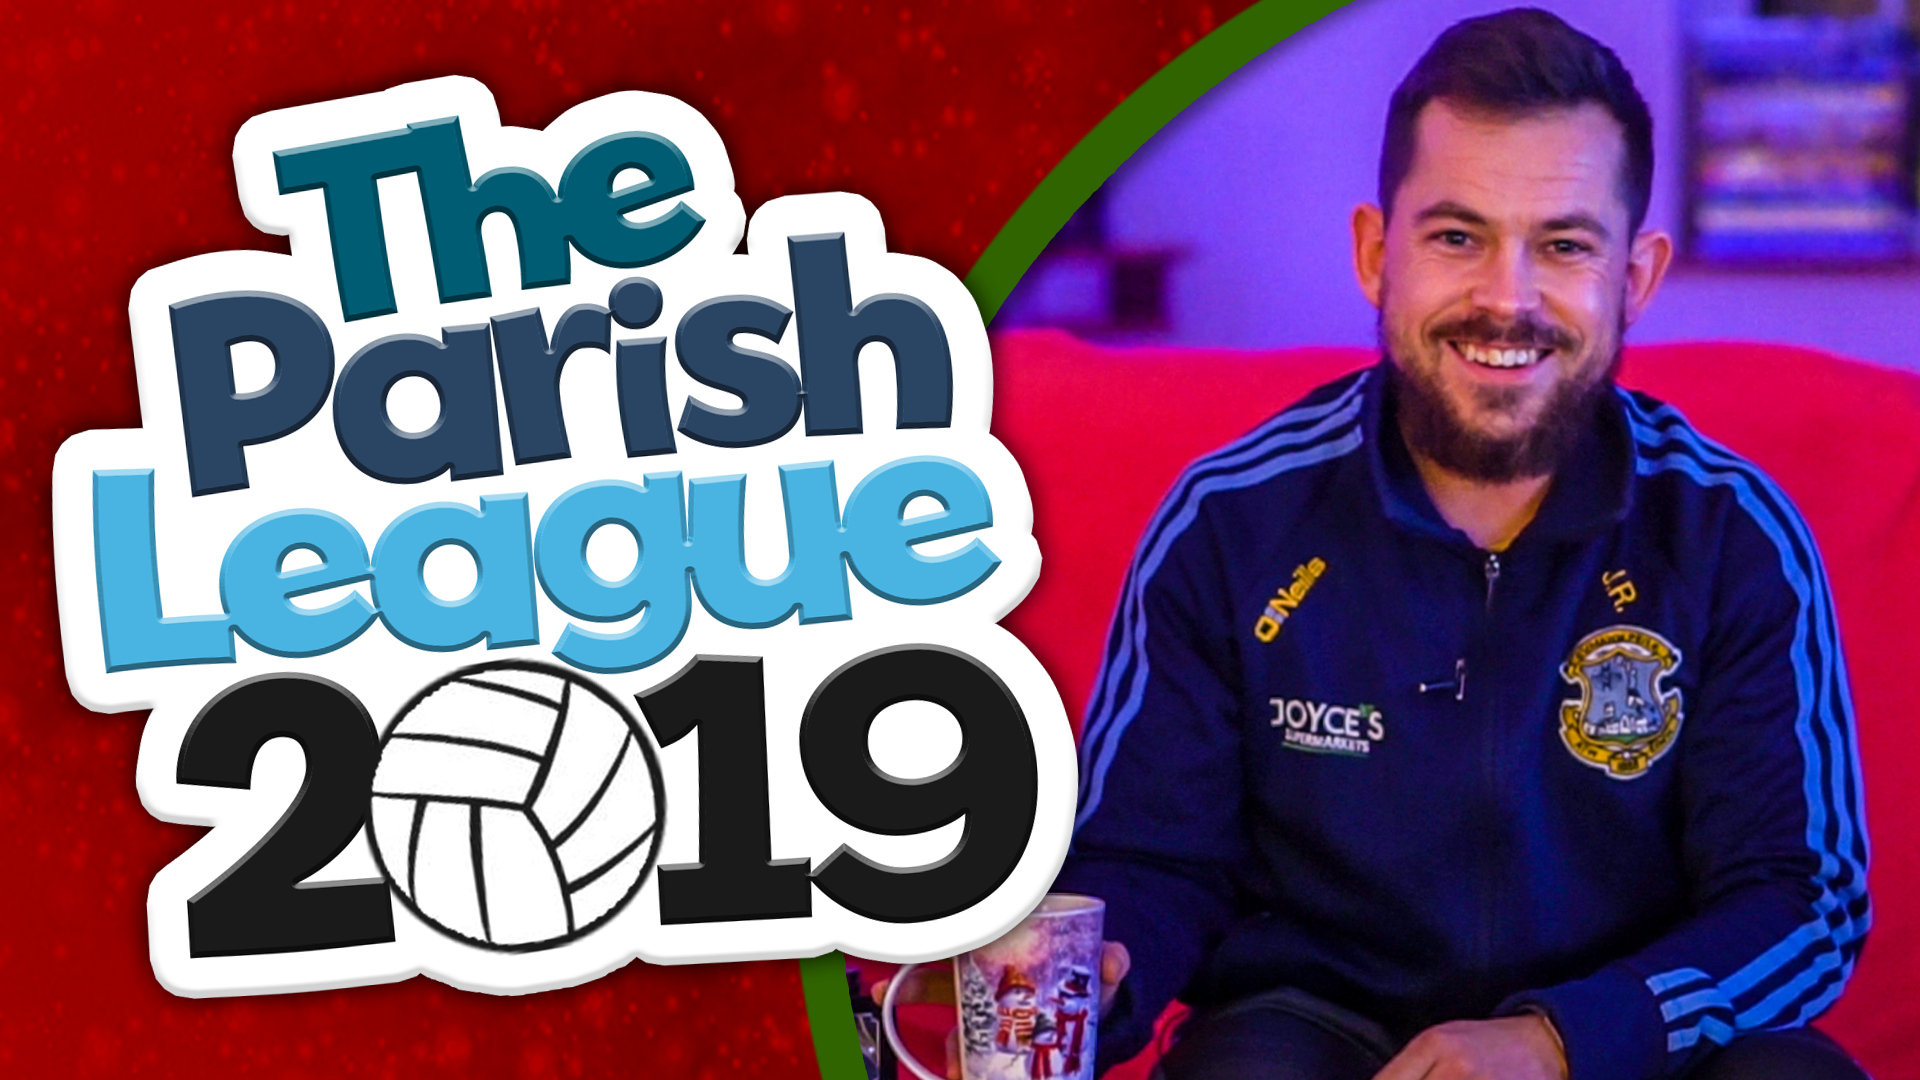 TJ Keady Parish League Charity Tournament 2019